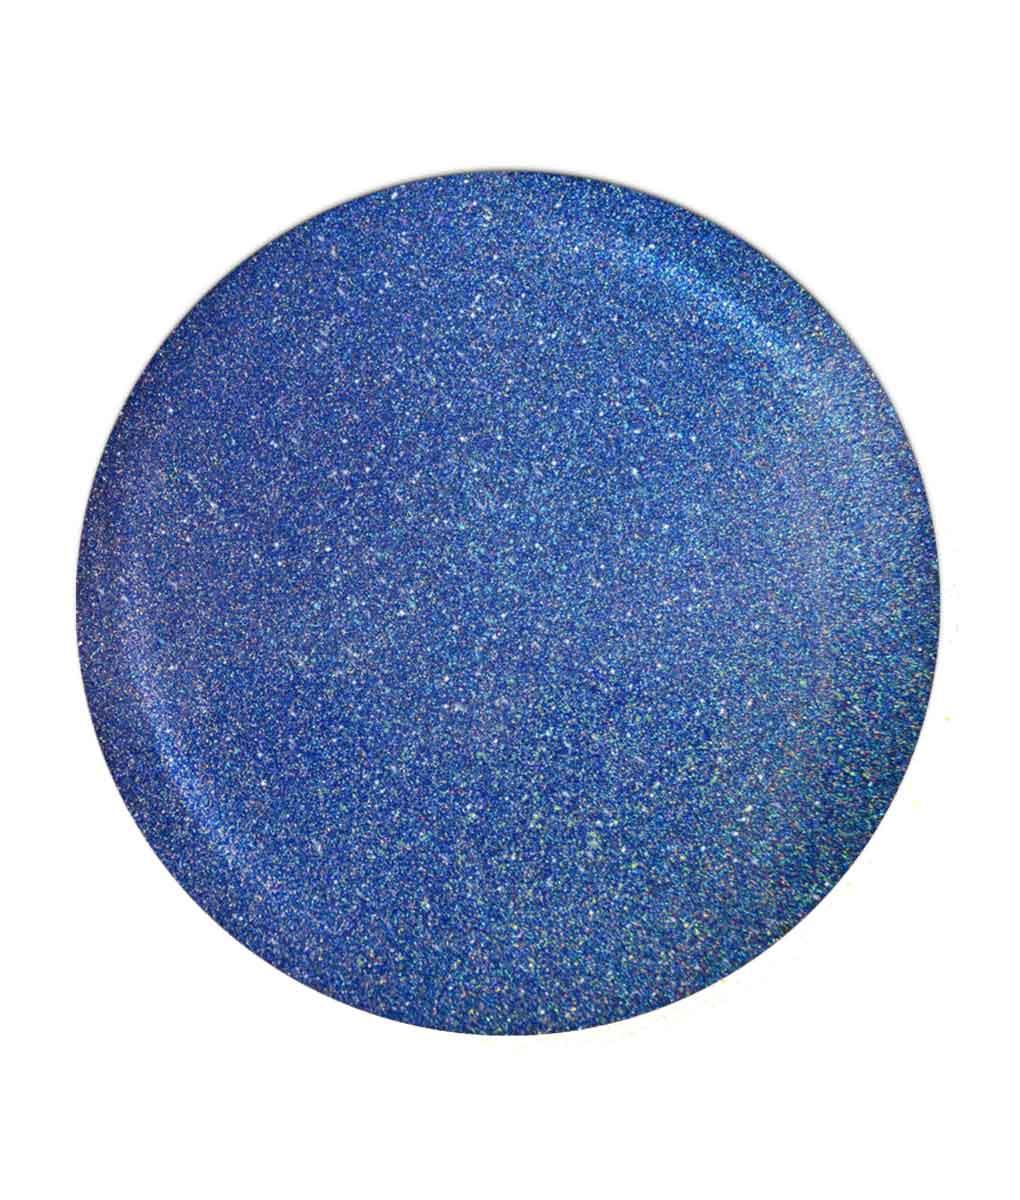 Glittergelé Moonstone